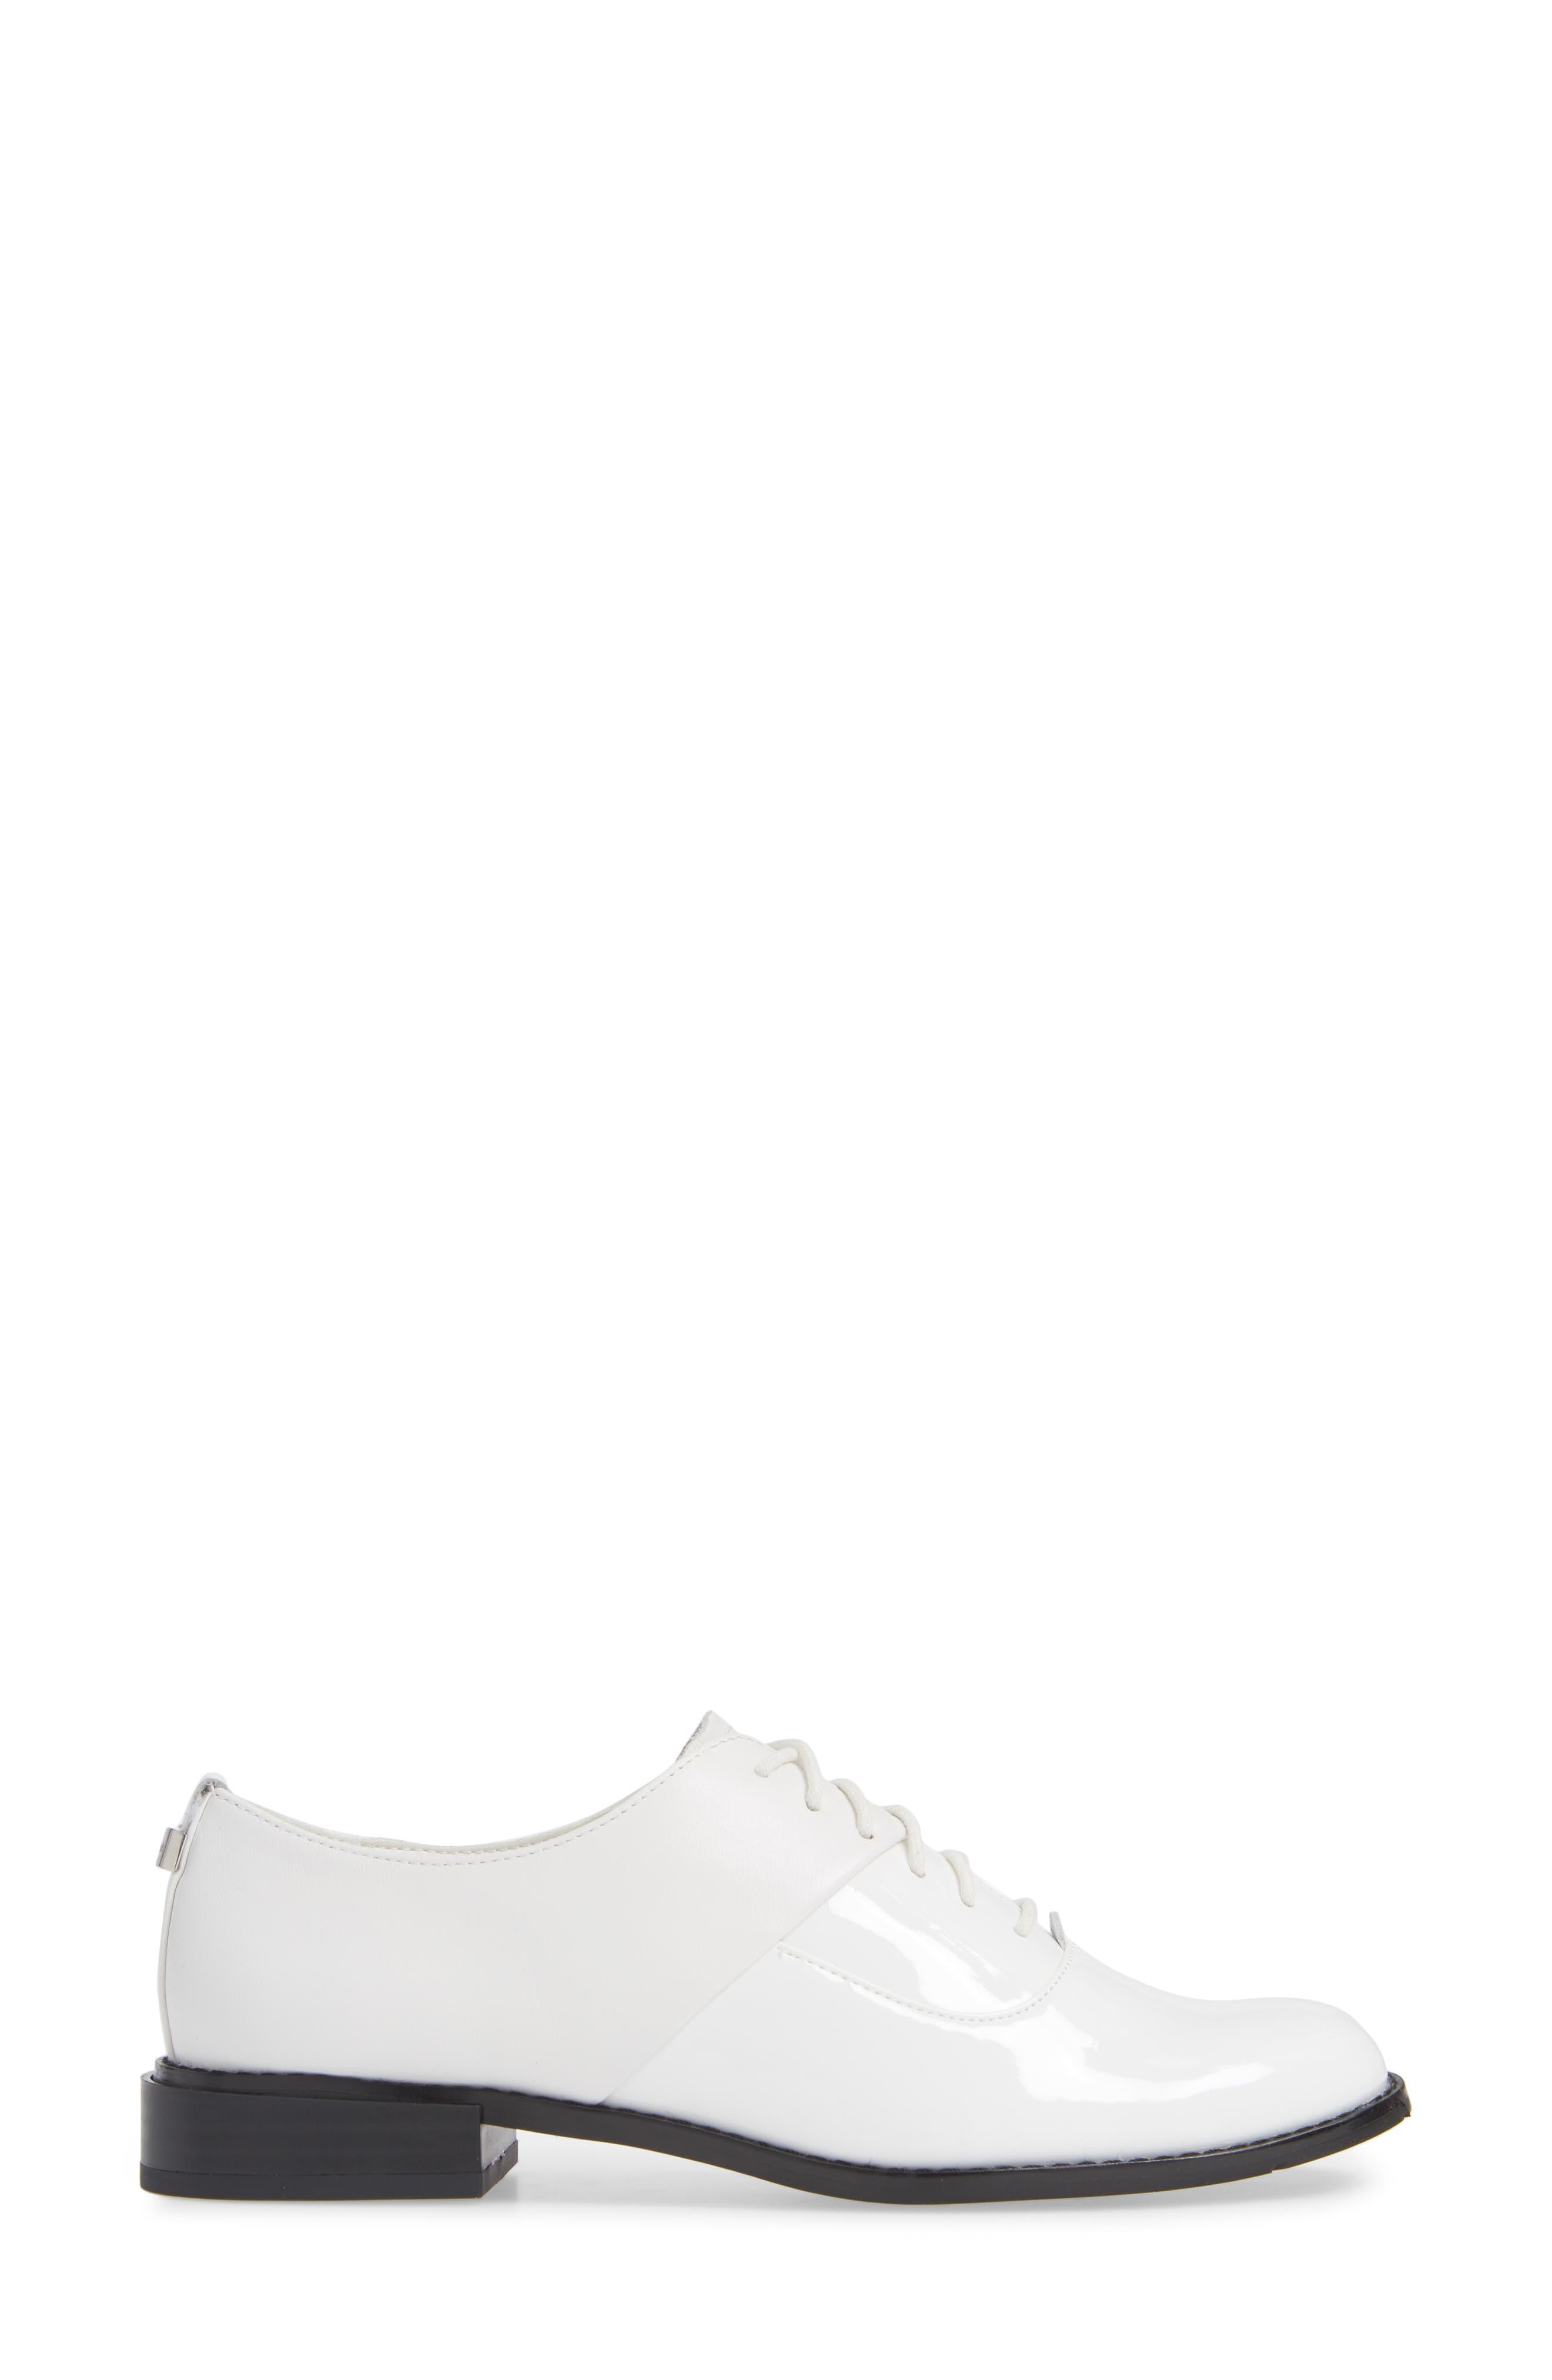 ,                             Aracely Oxford,                             Alternate thumbnail 3, color,                             PLATINUM WHITE PATENT